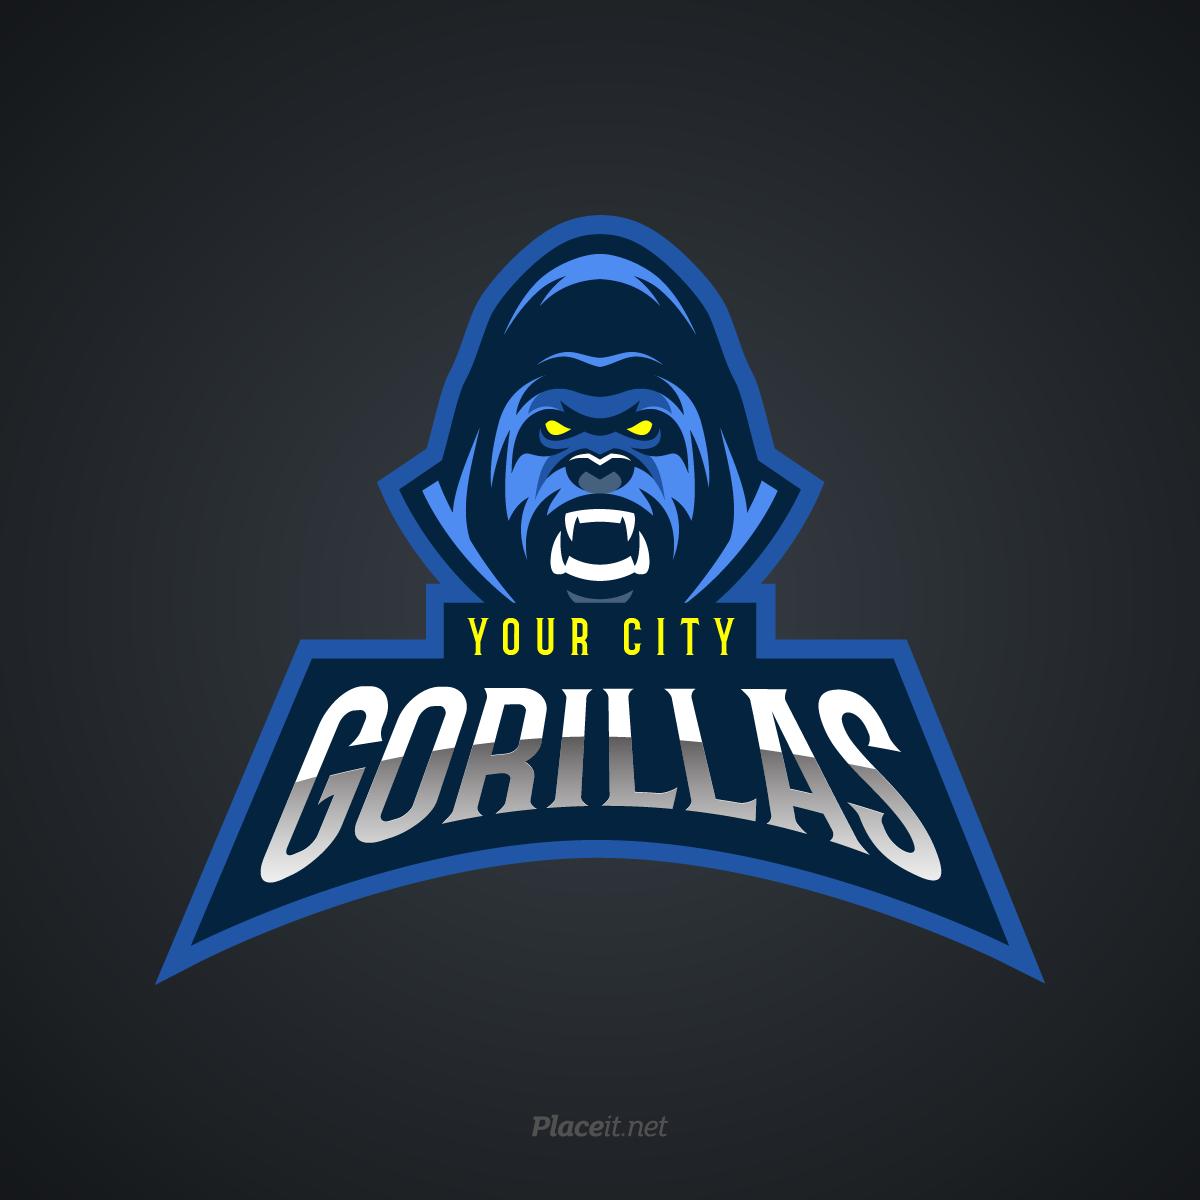 Gorillas sports logo